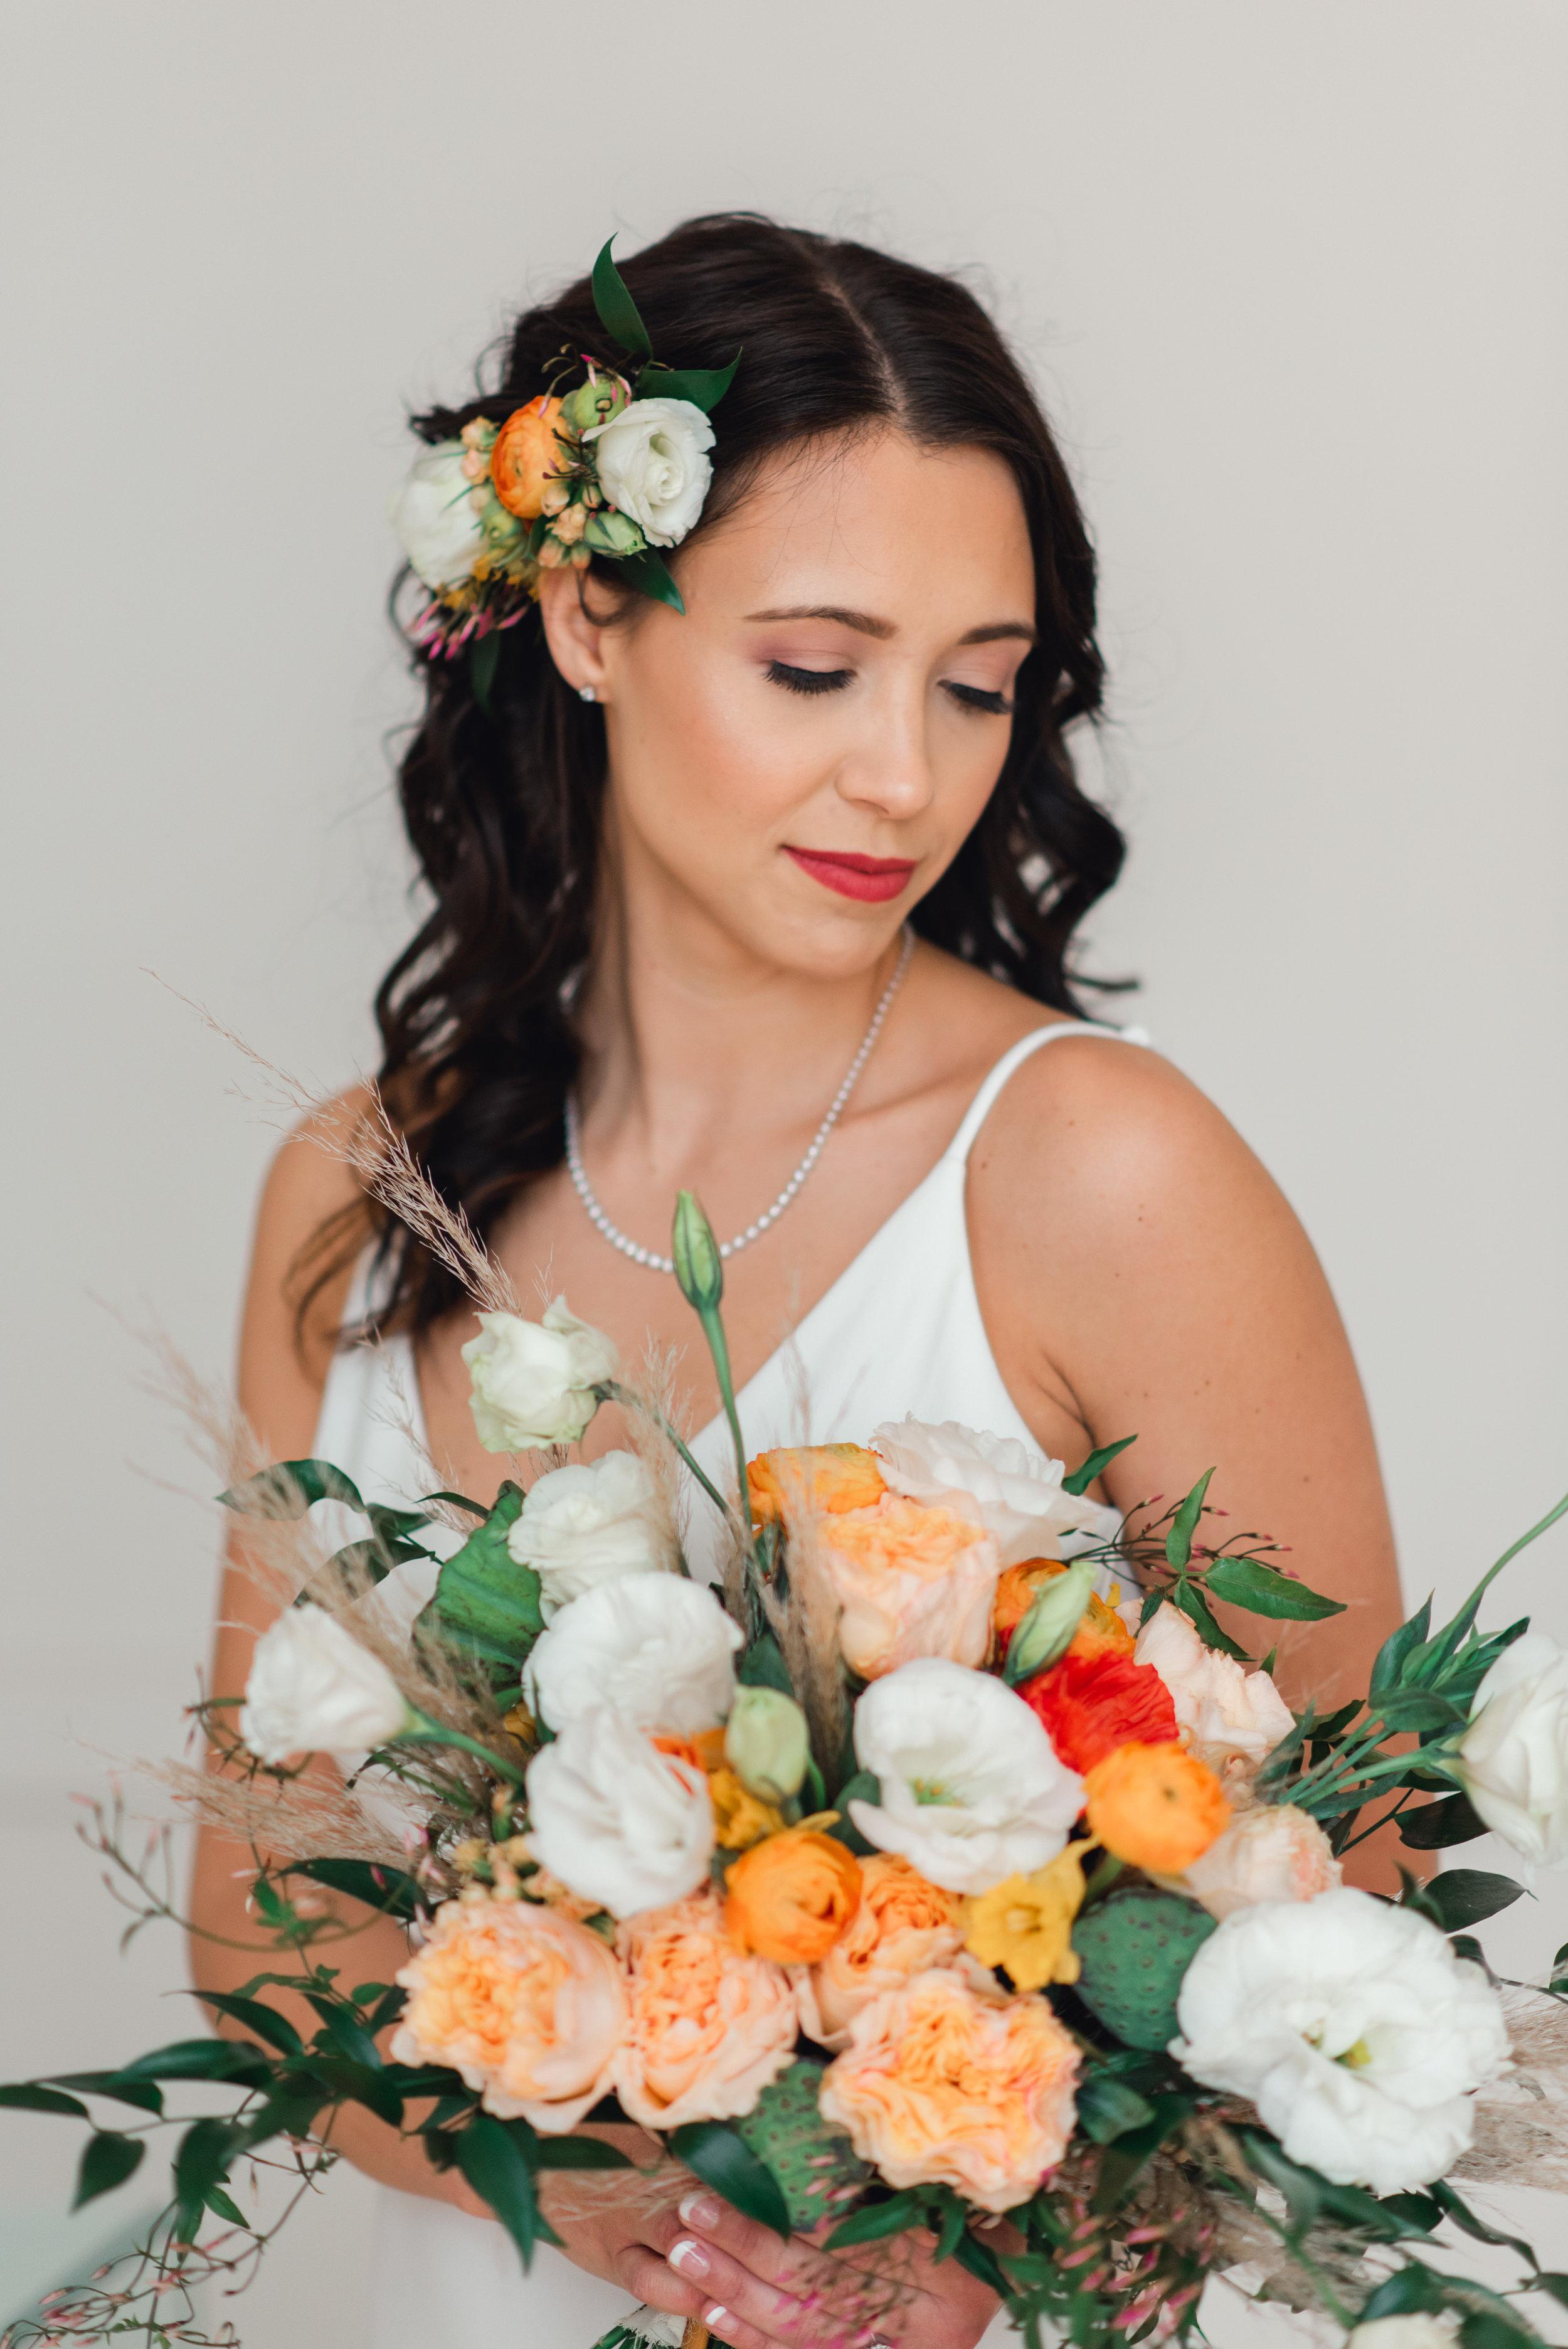 minnesota-wedding-bouquet